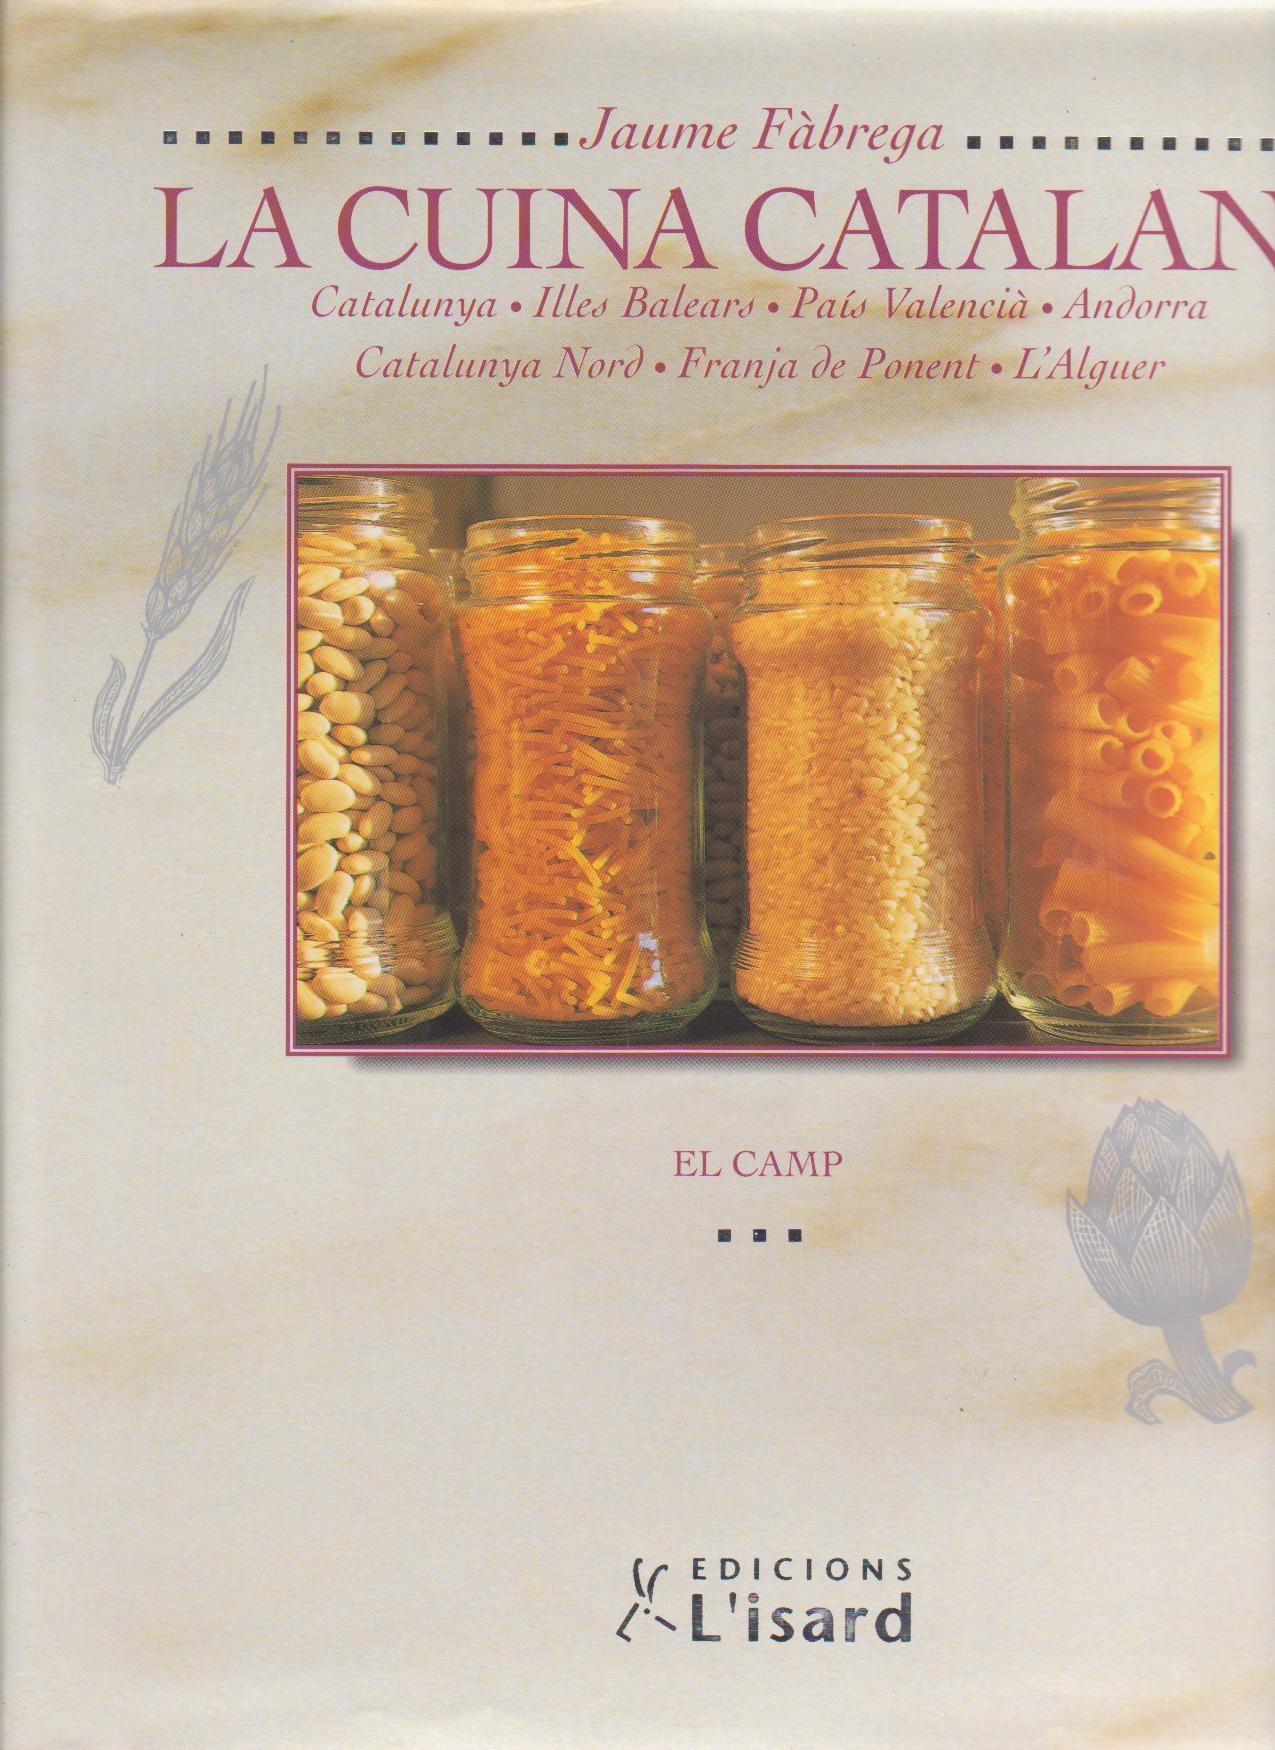 La cuina catalana